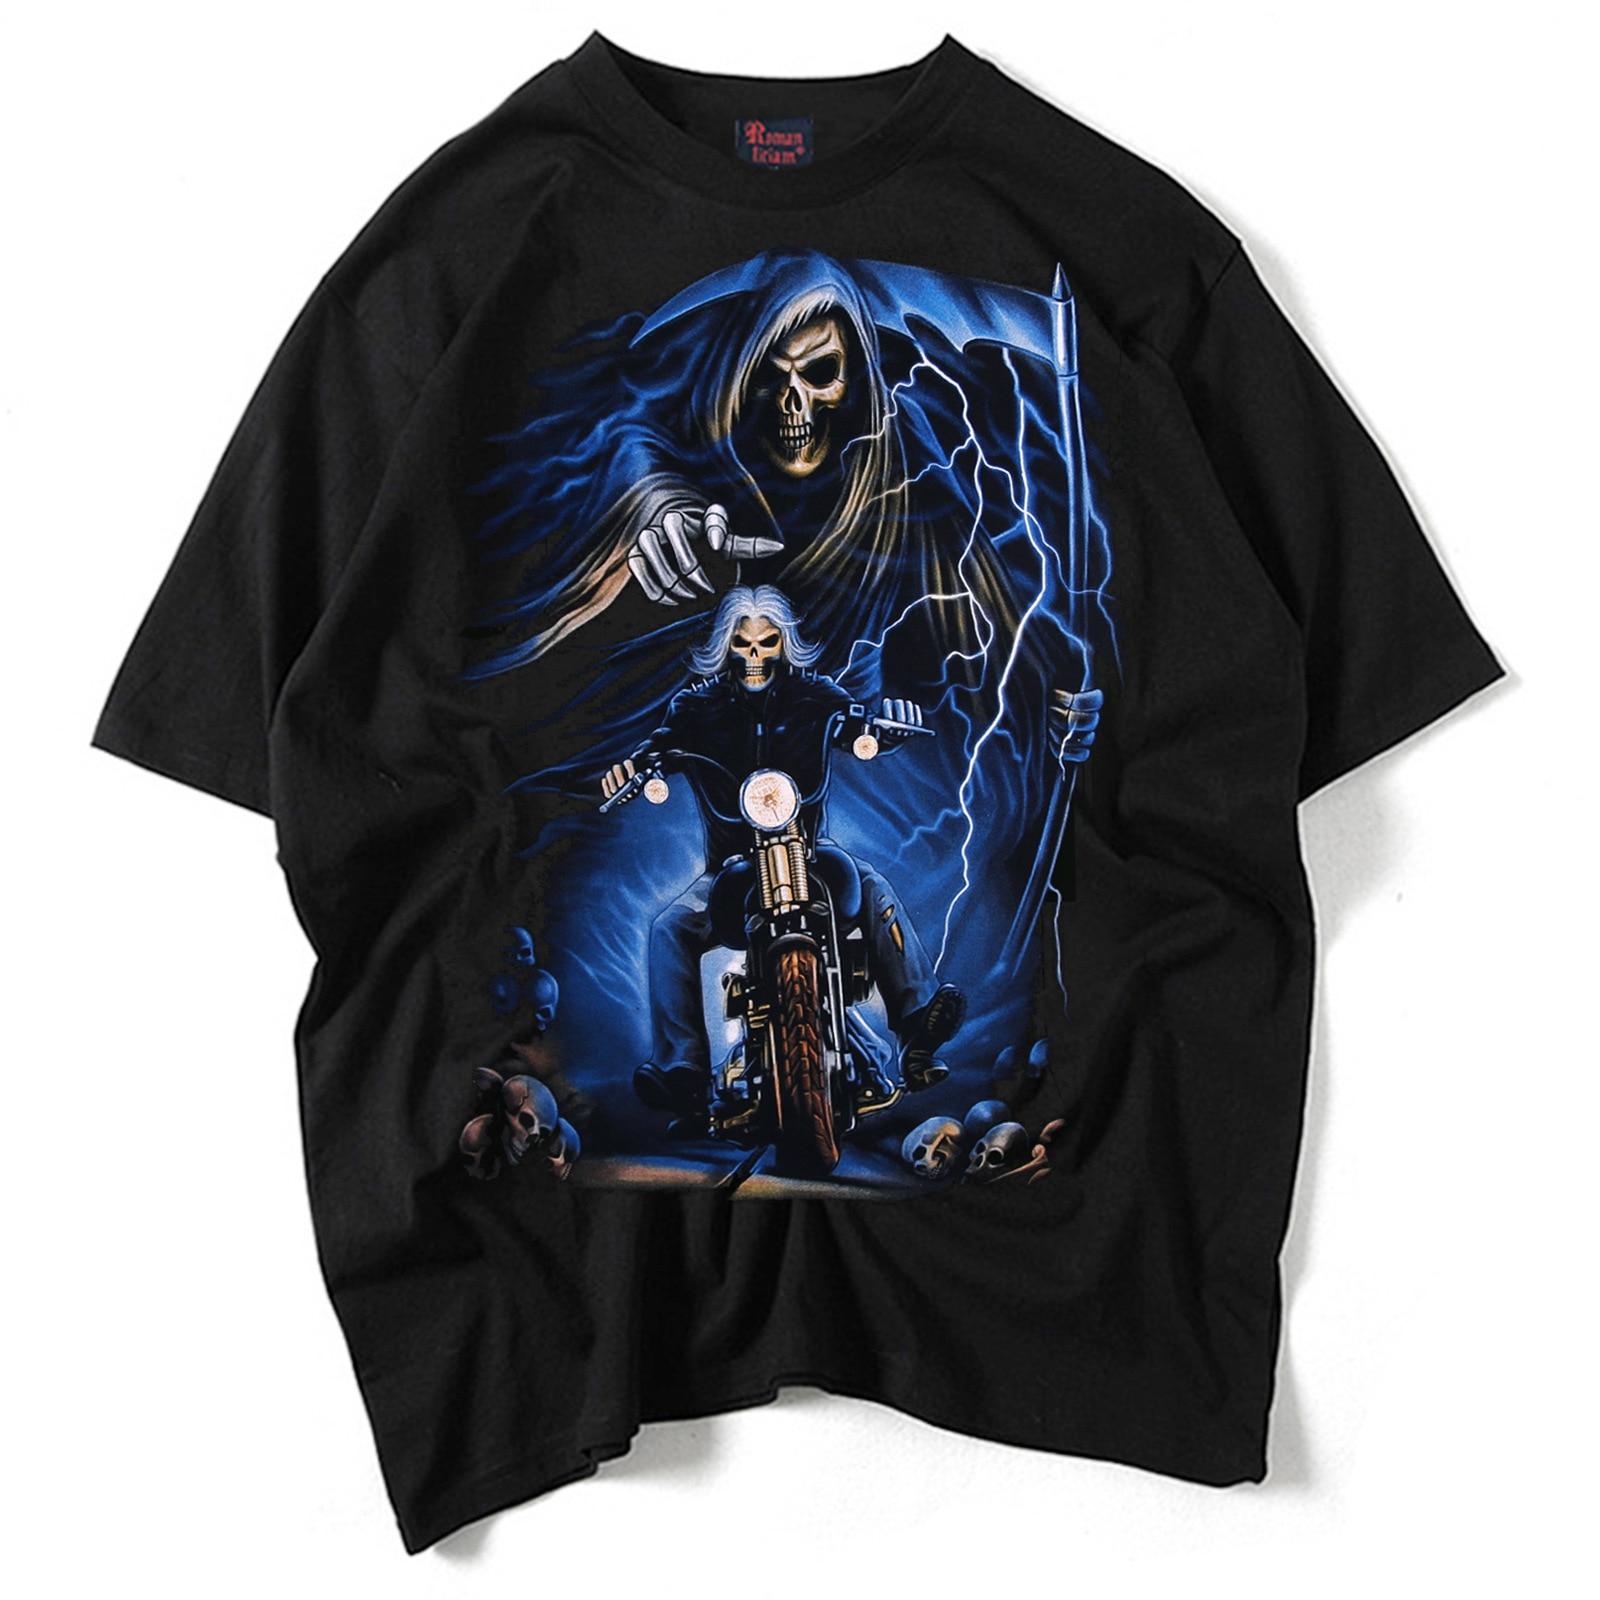 RL 2019 여름 인간의 3D 인쇄 티셔츠 맨 최고 품질의 검은 색 오 - 넥 반팔 XXL 순수 코튼 남성 의류 MT